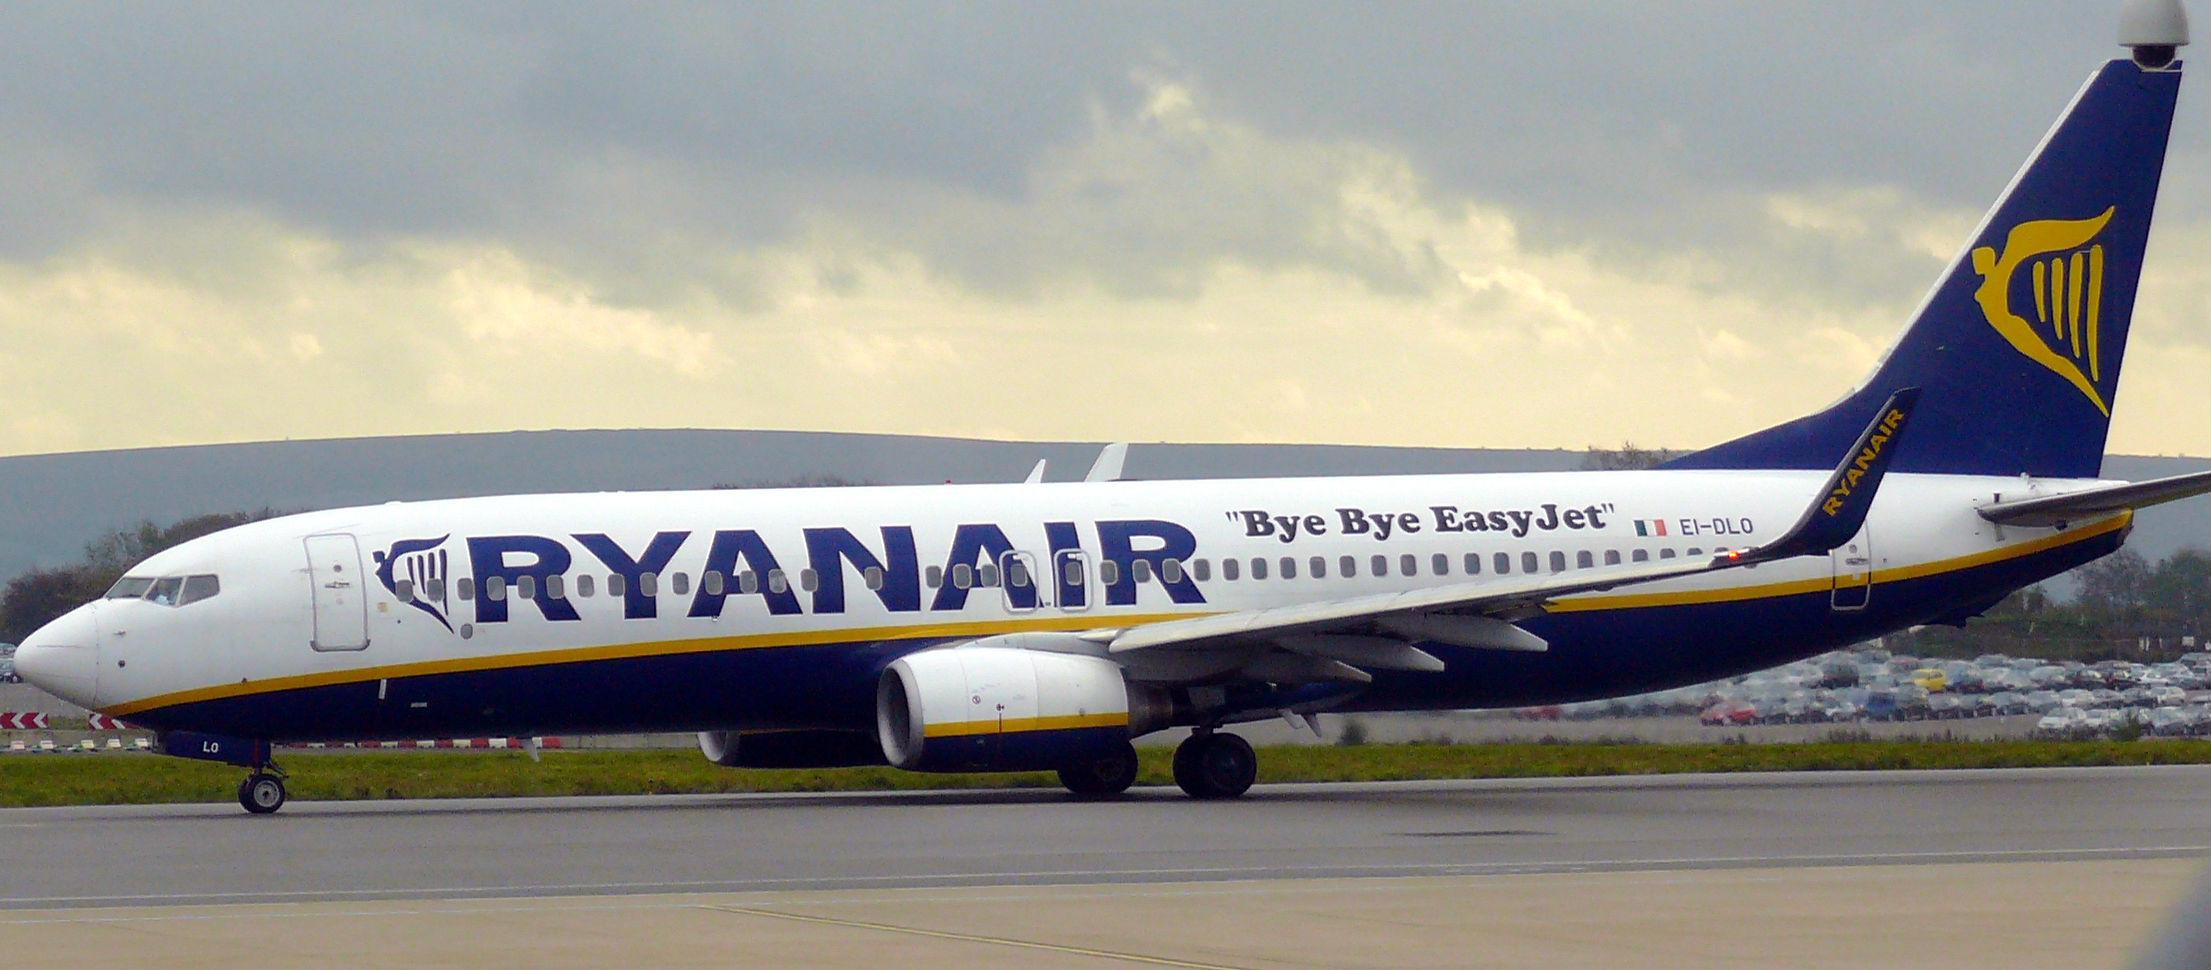 8 Dublin Ryanair Flights Cancelled Today